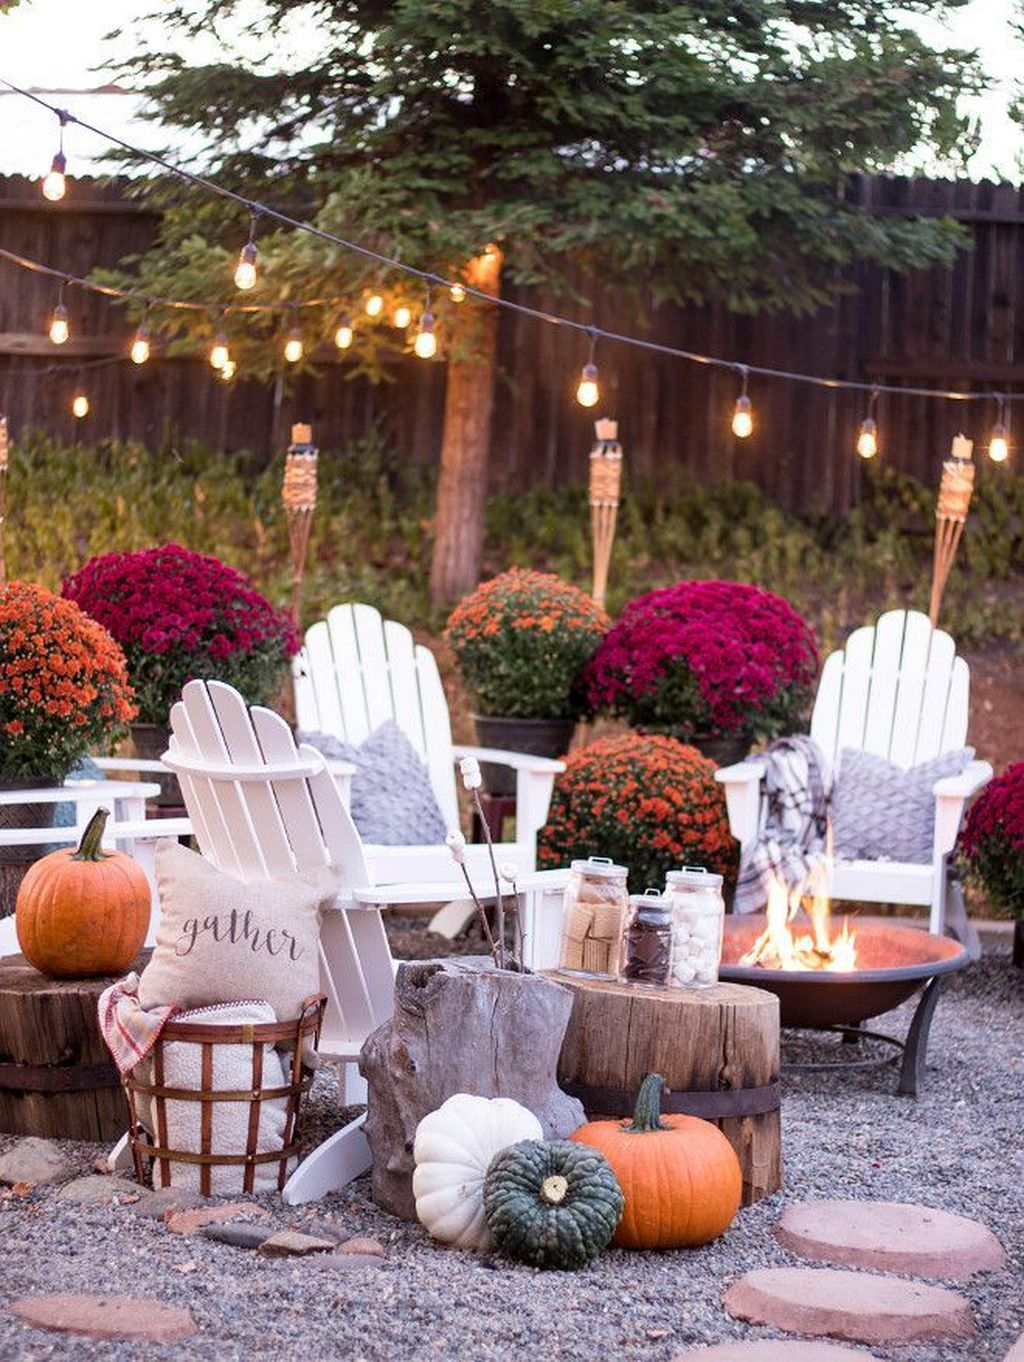 Fabulous Fall Backyard Party Decorations Ideas 33